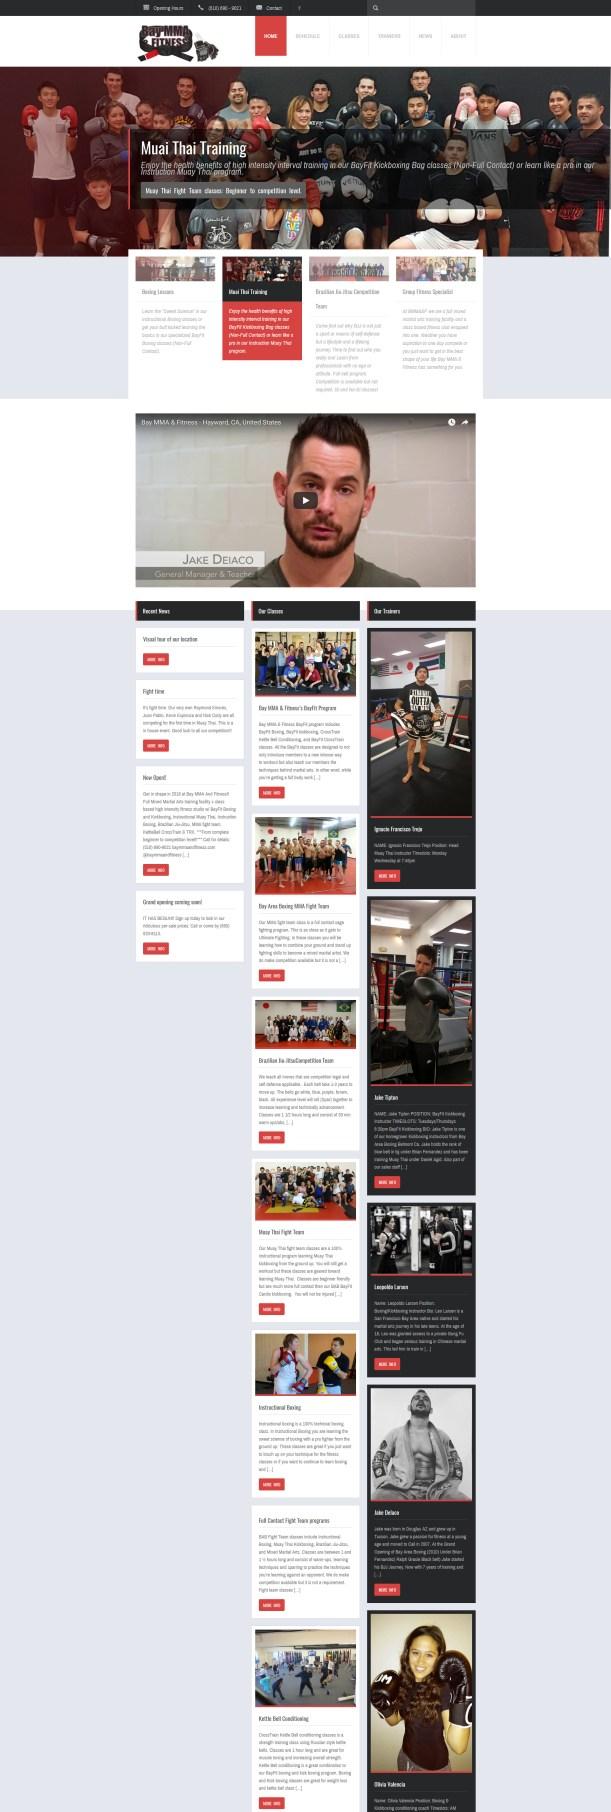 Bay Area MMA Fitness Bay Area MMA Fitness